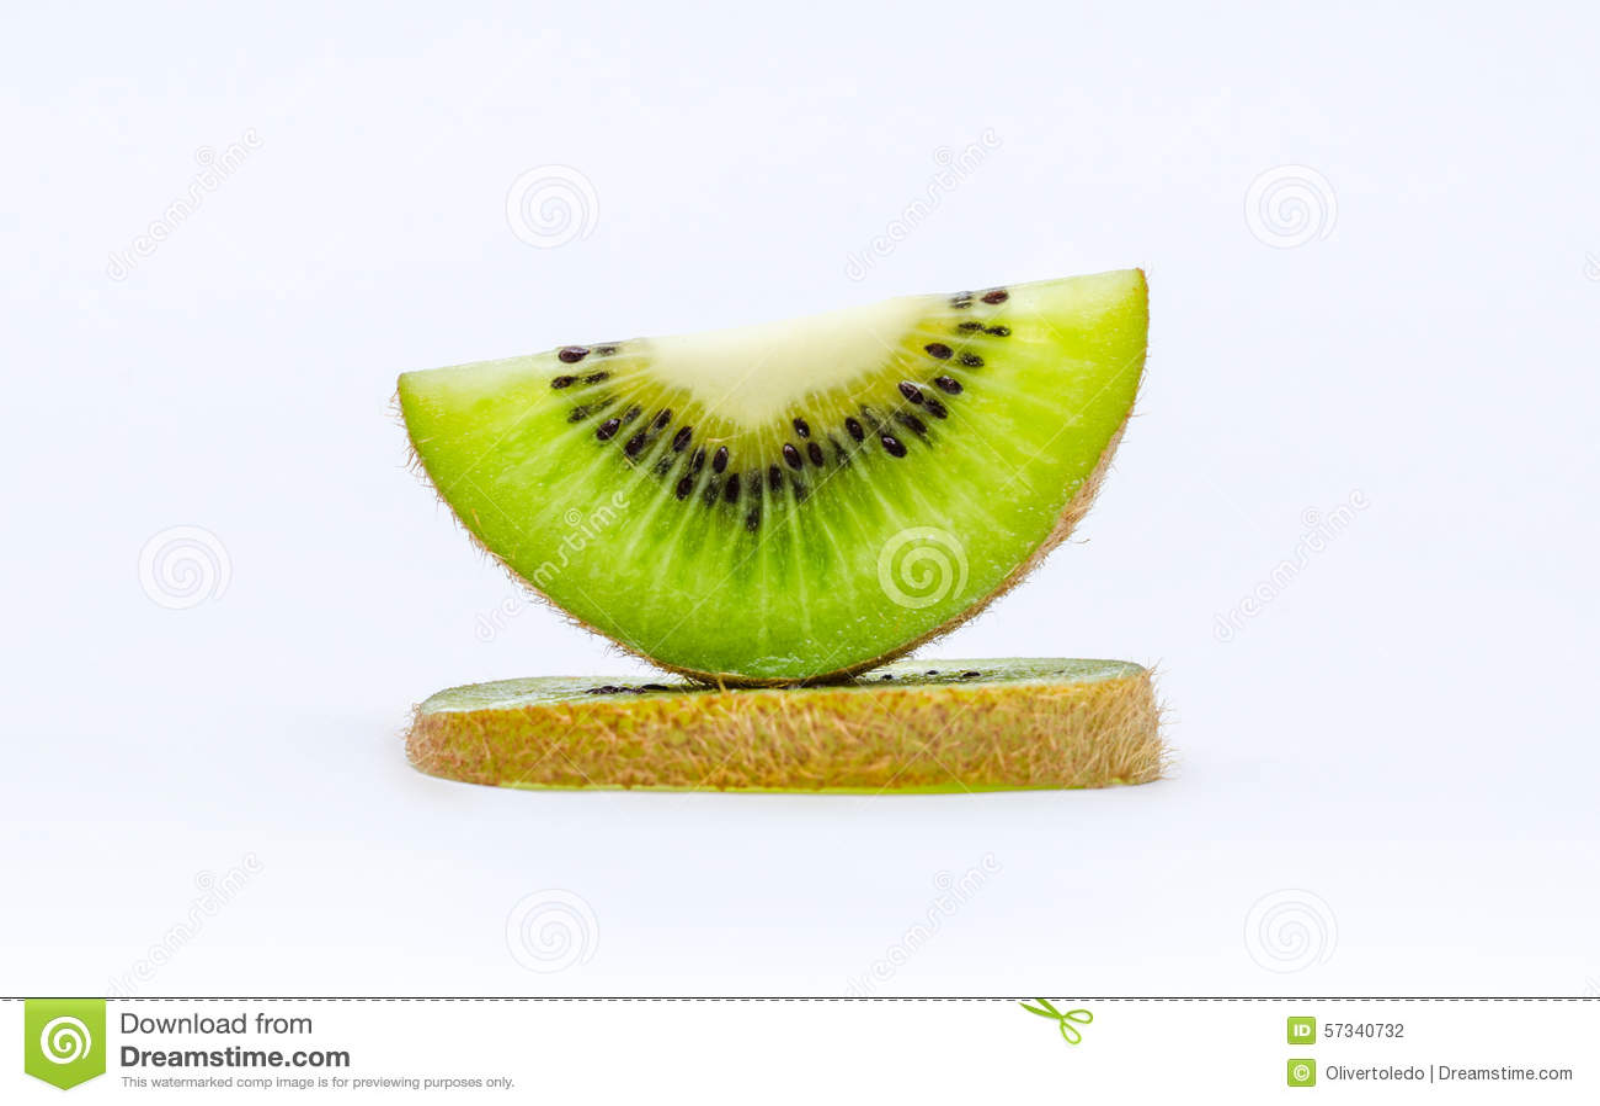 Little kiwi